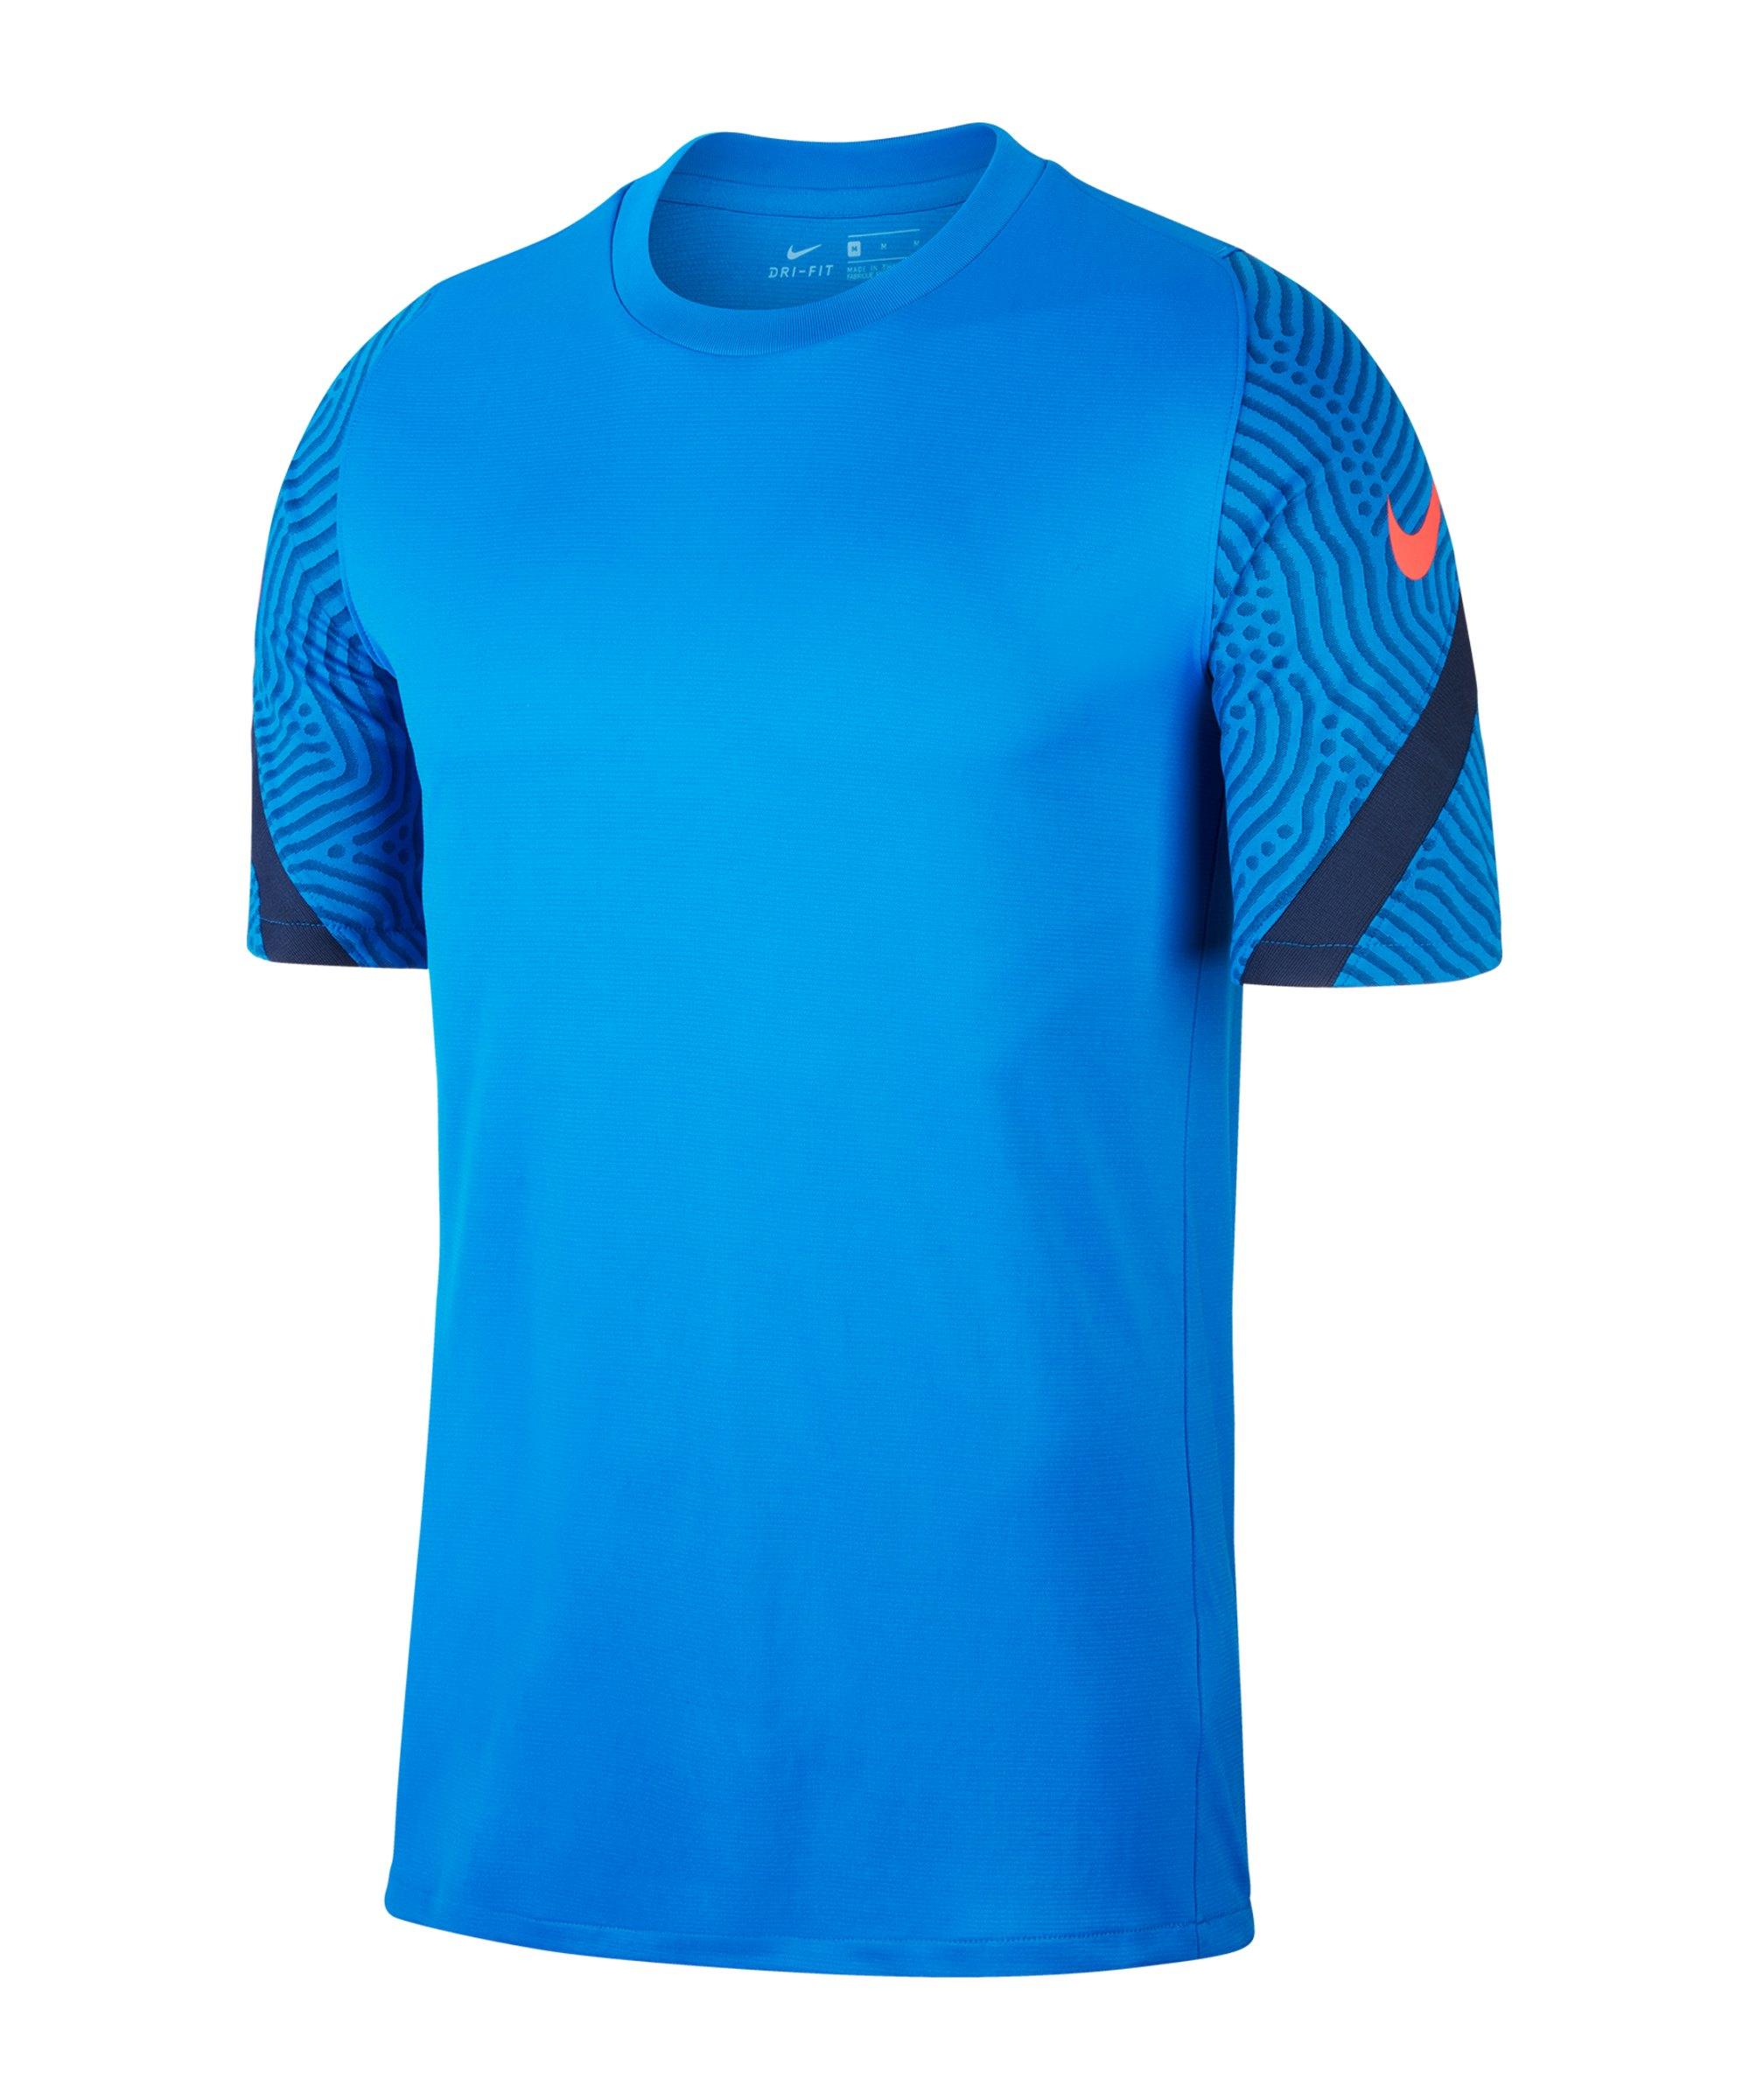 Nike Strike Shirt kurzarm Blau F427 - blau